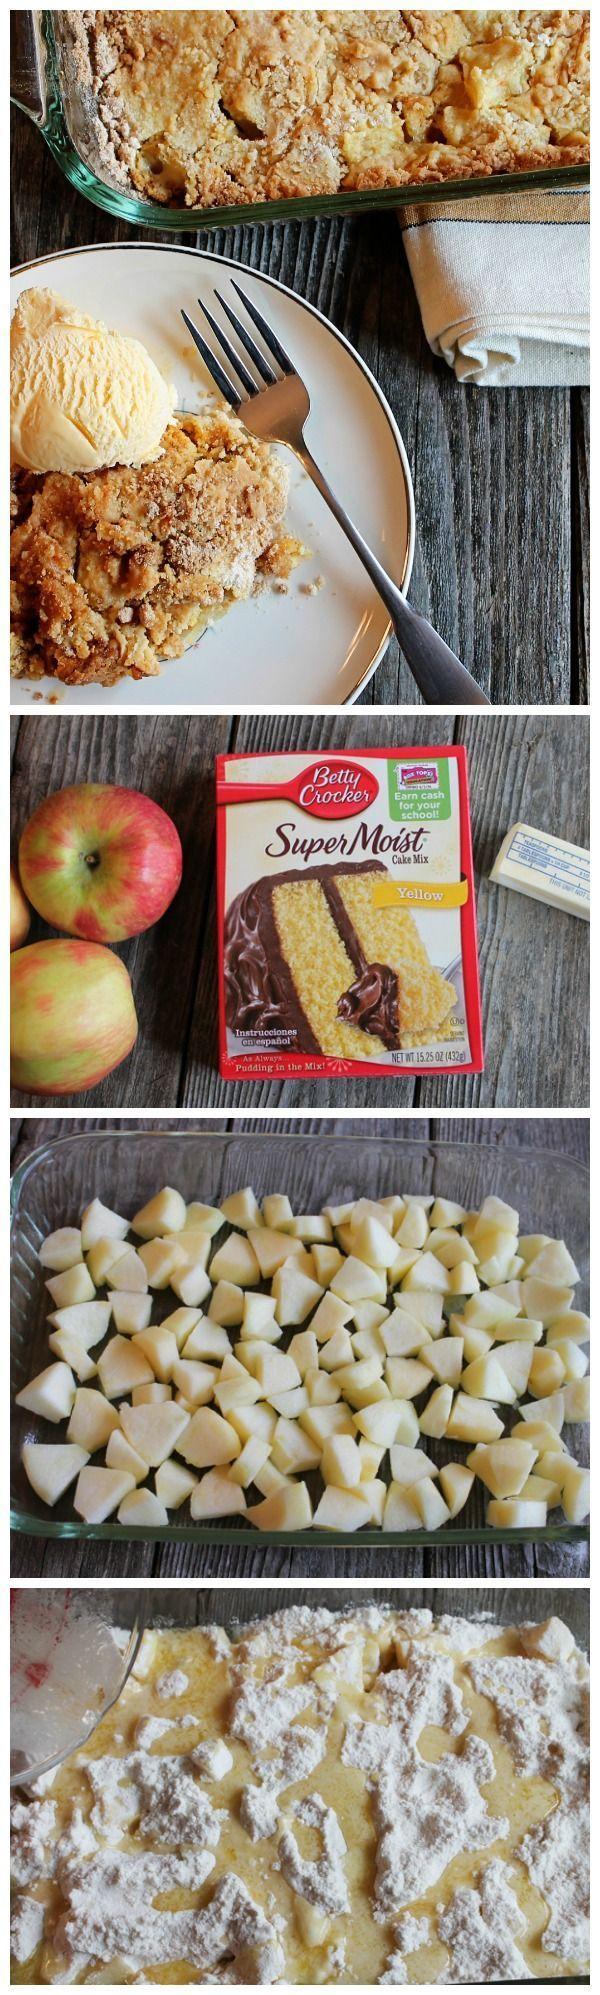 Fresh apples + Betty Crocker yellow cake + melted butter = easy fall dessert.